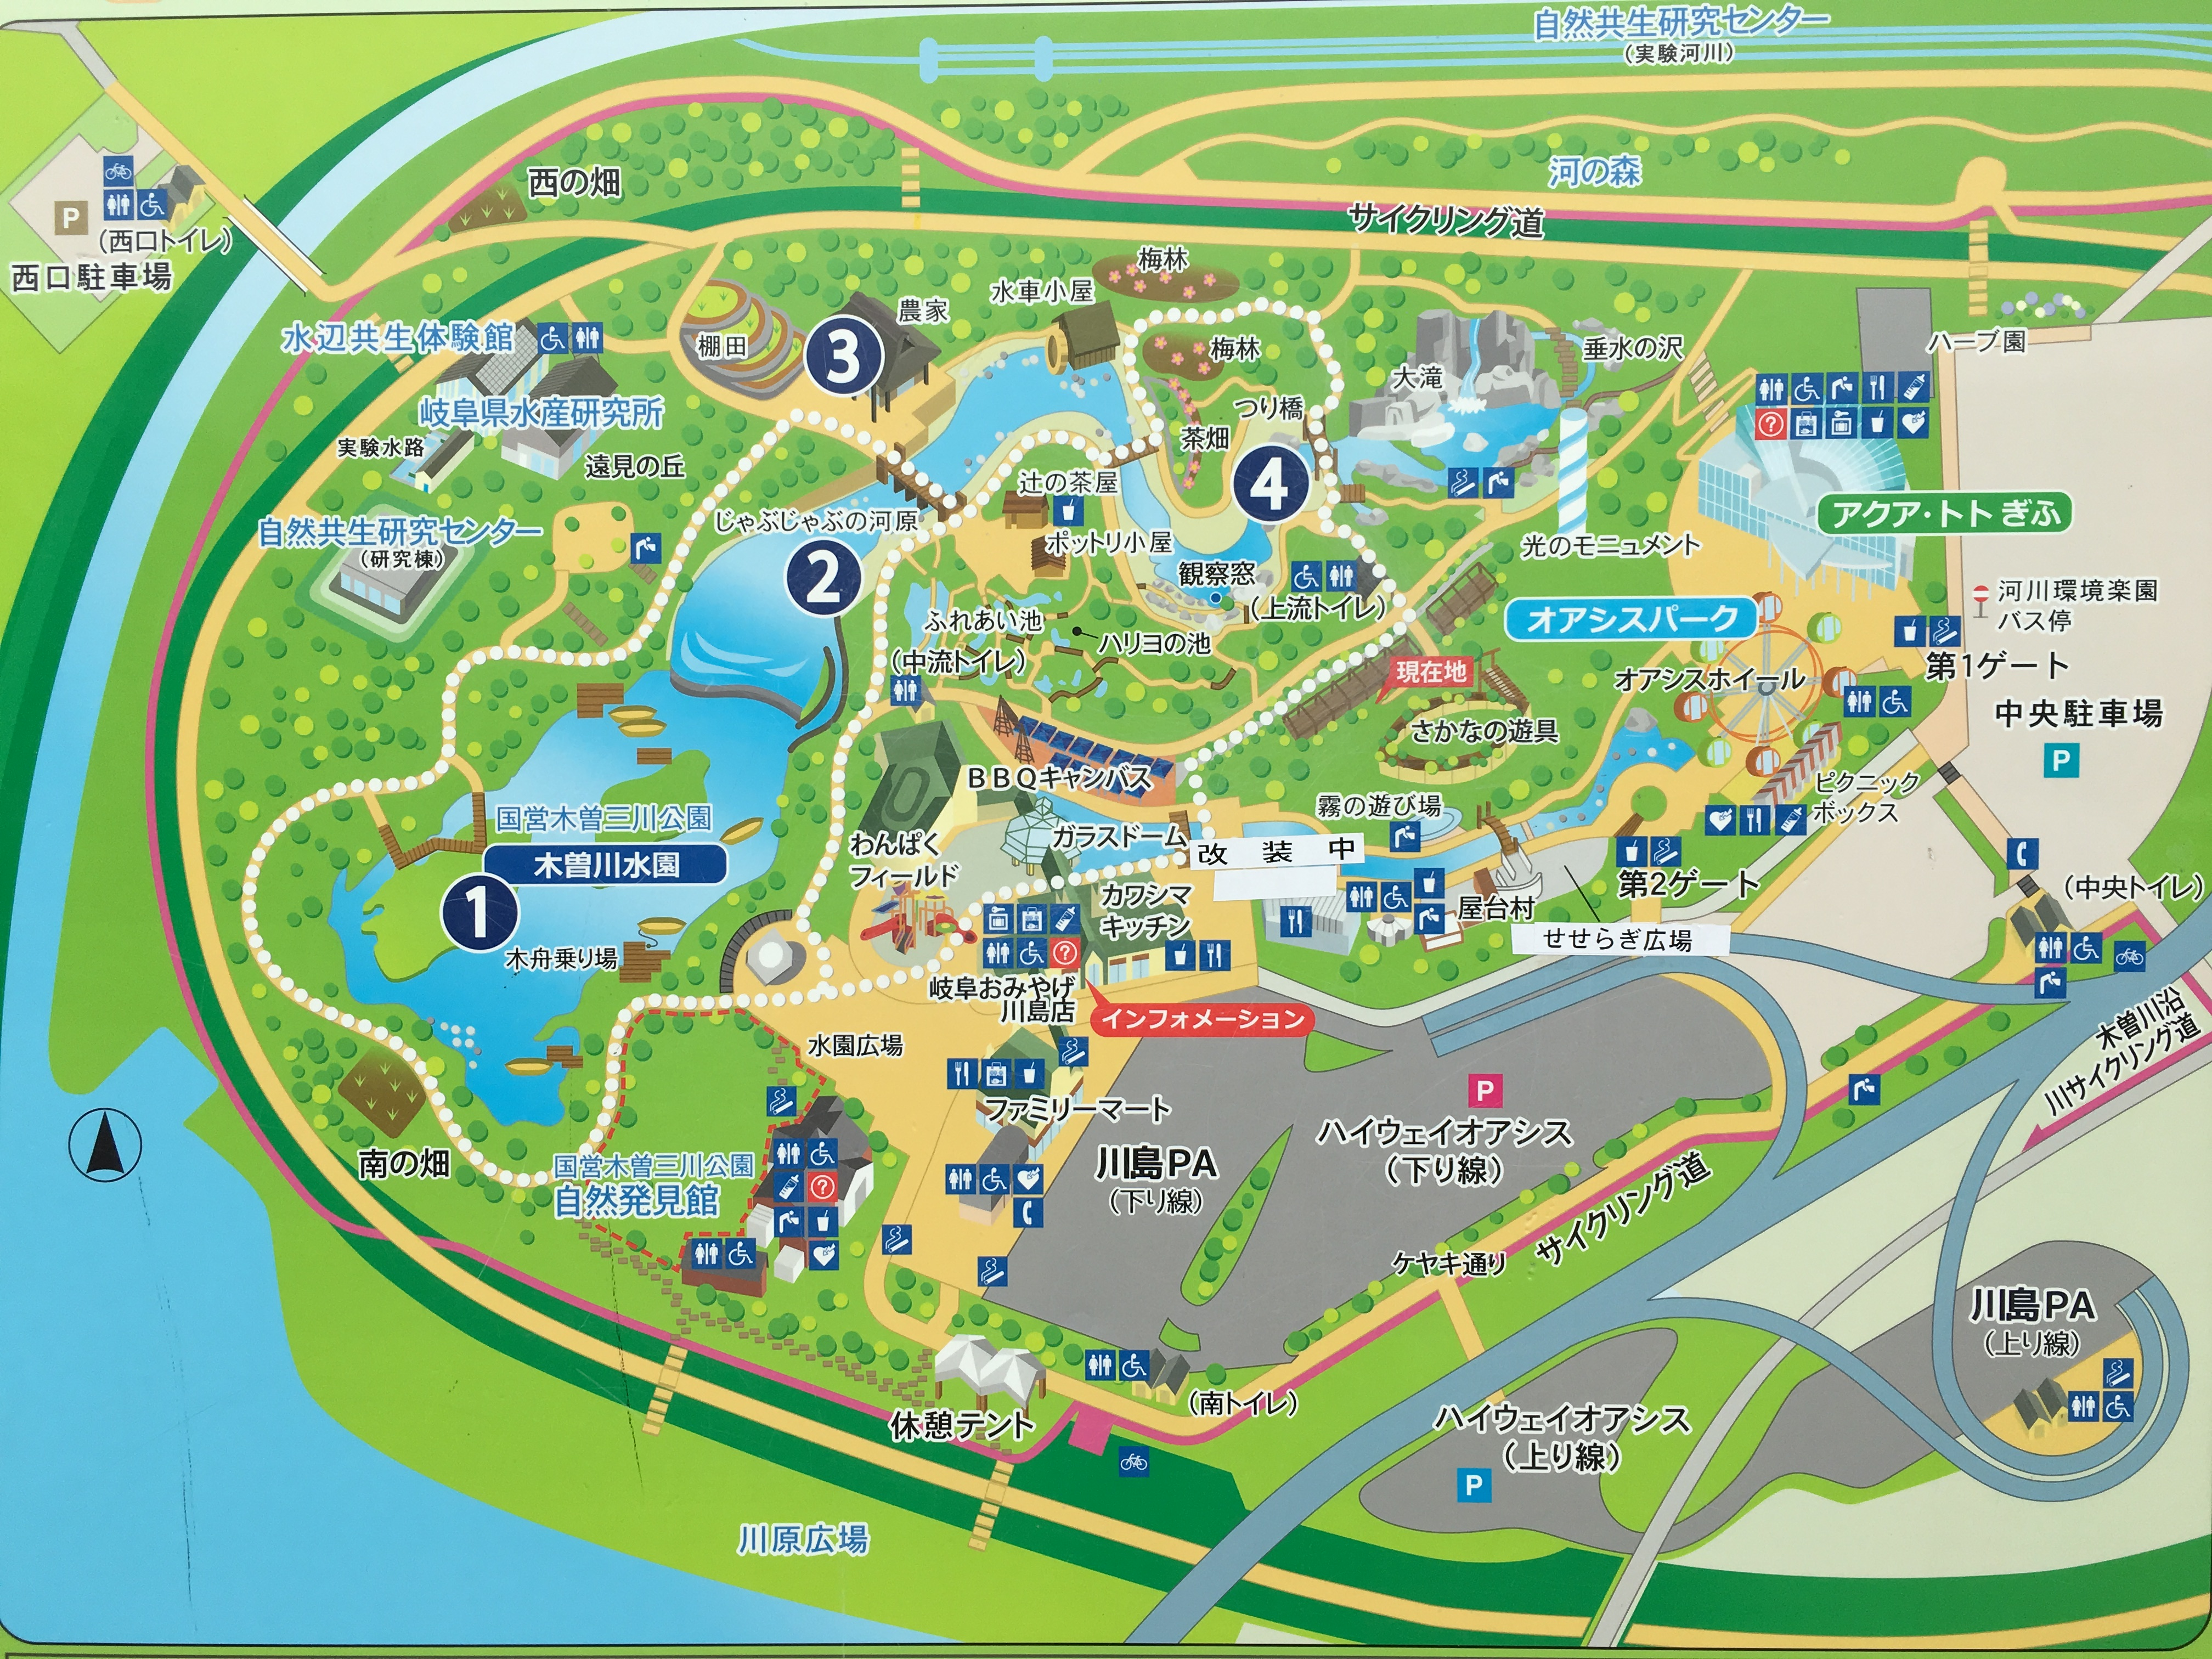 aquatotto-oasispark-parking